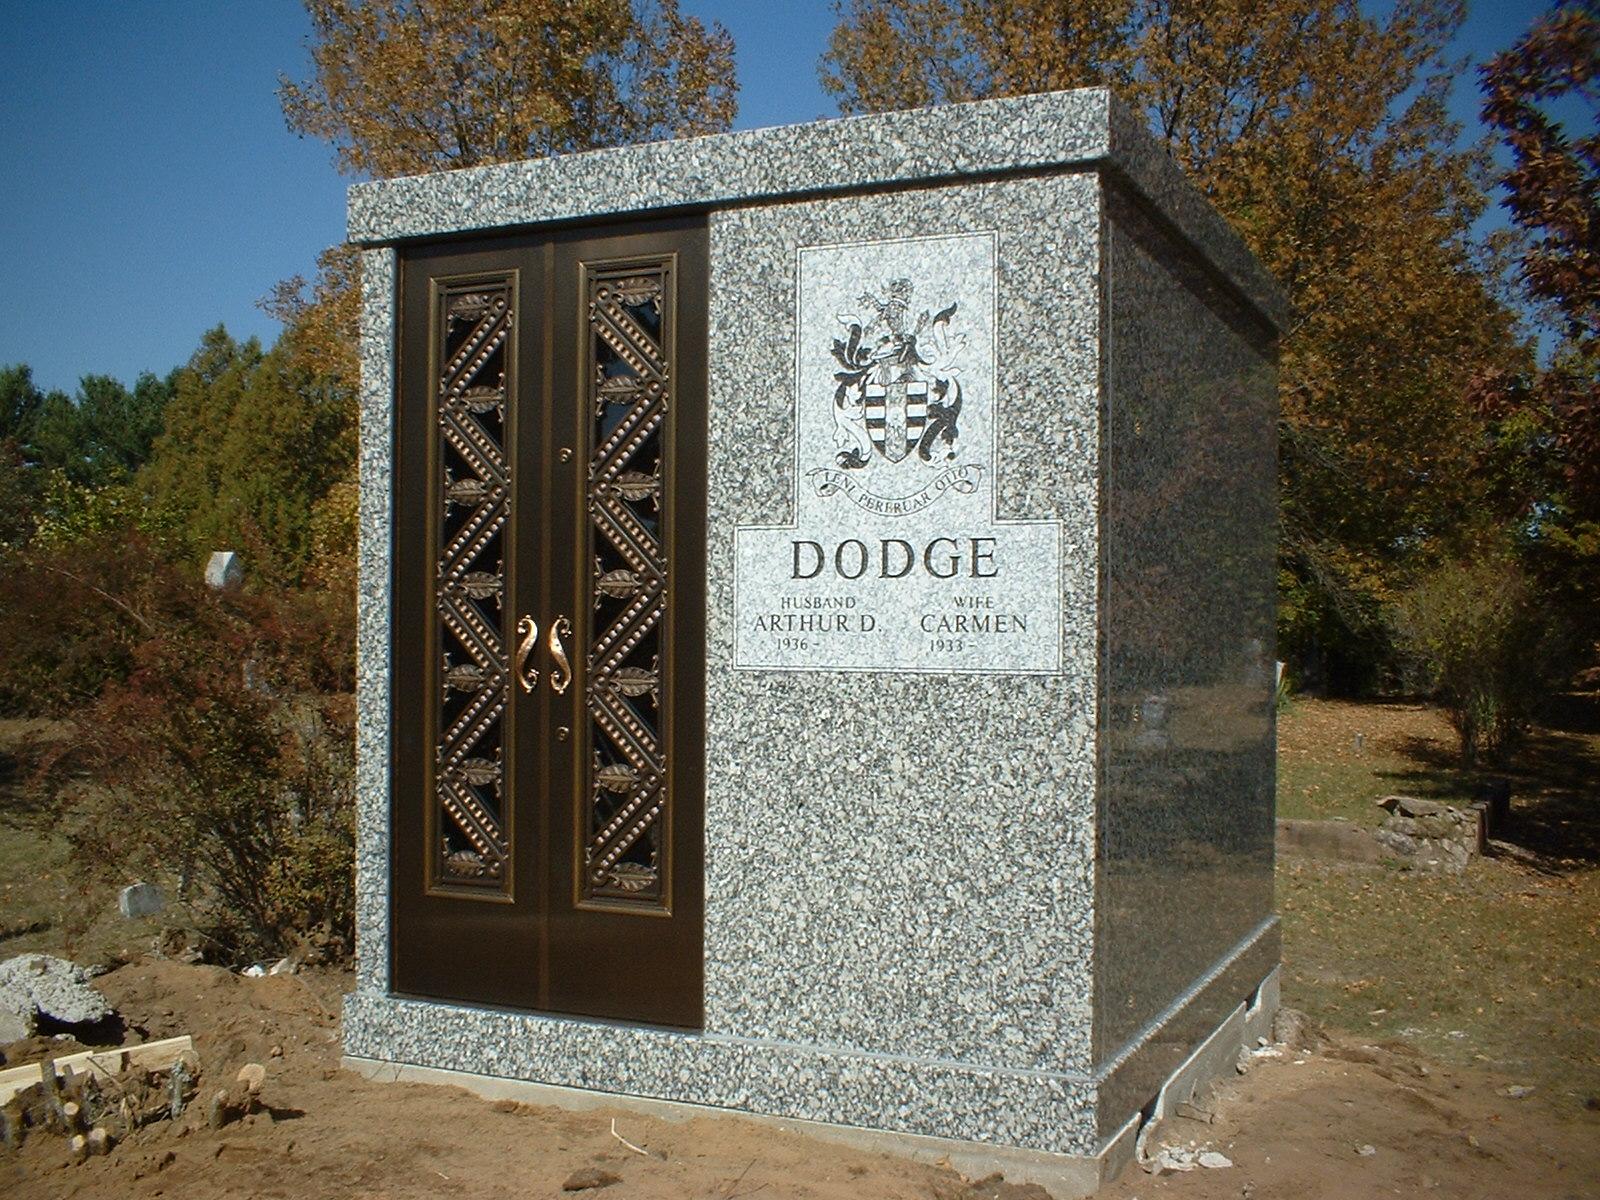 Dodge Mausoleum